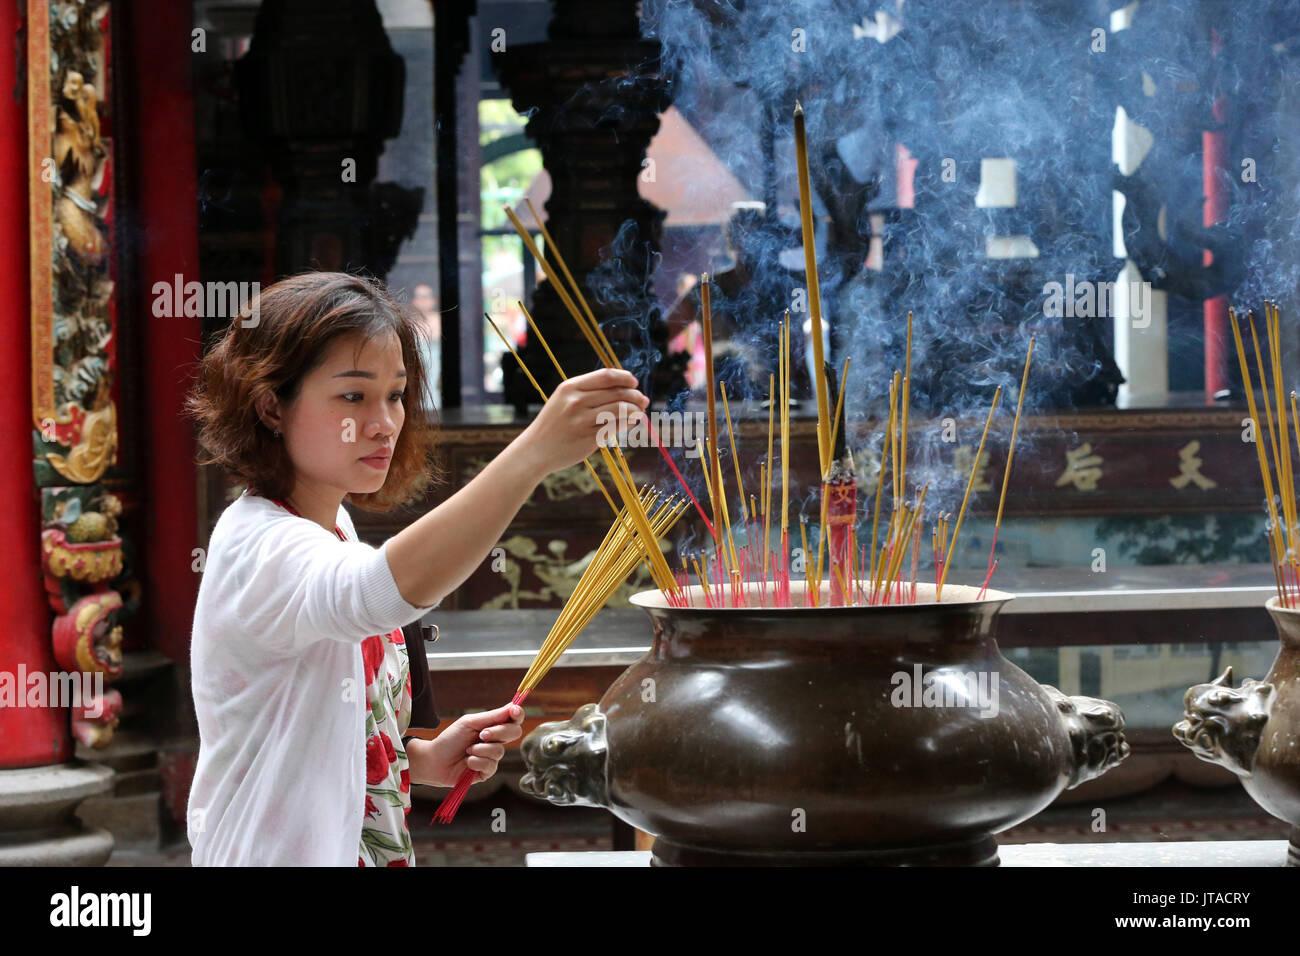 Buddhist worshipper placing incense sticks on joss stick pot, Taoist temple, Phuoc An Hoi Quan Pagoda, Ho Chi Minh City, Vietnam - Stock Image